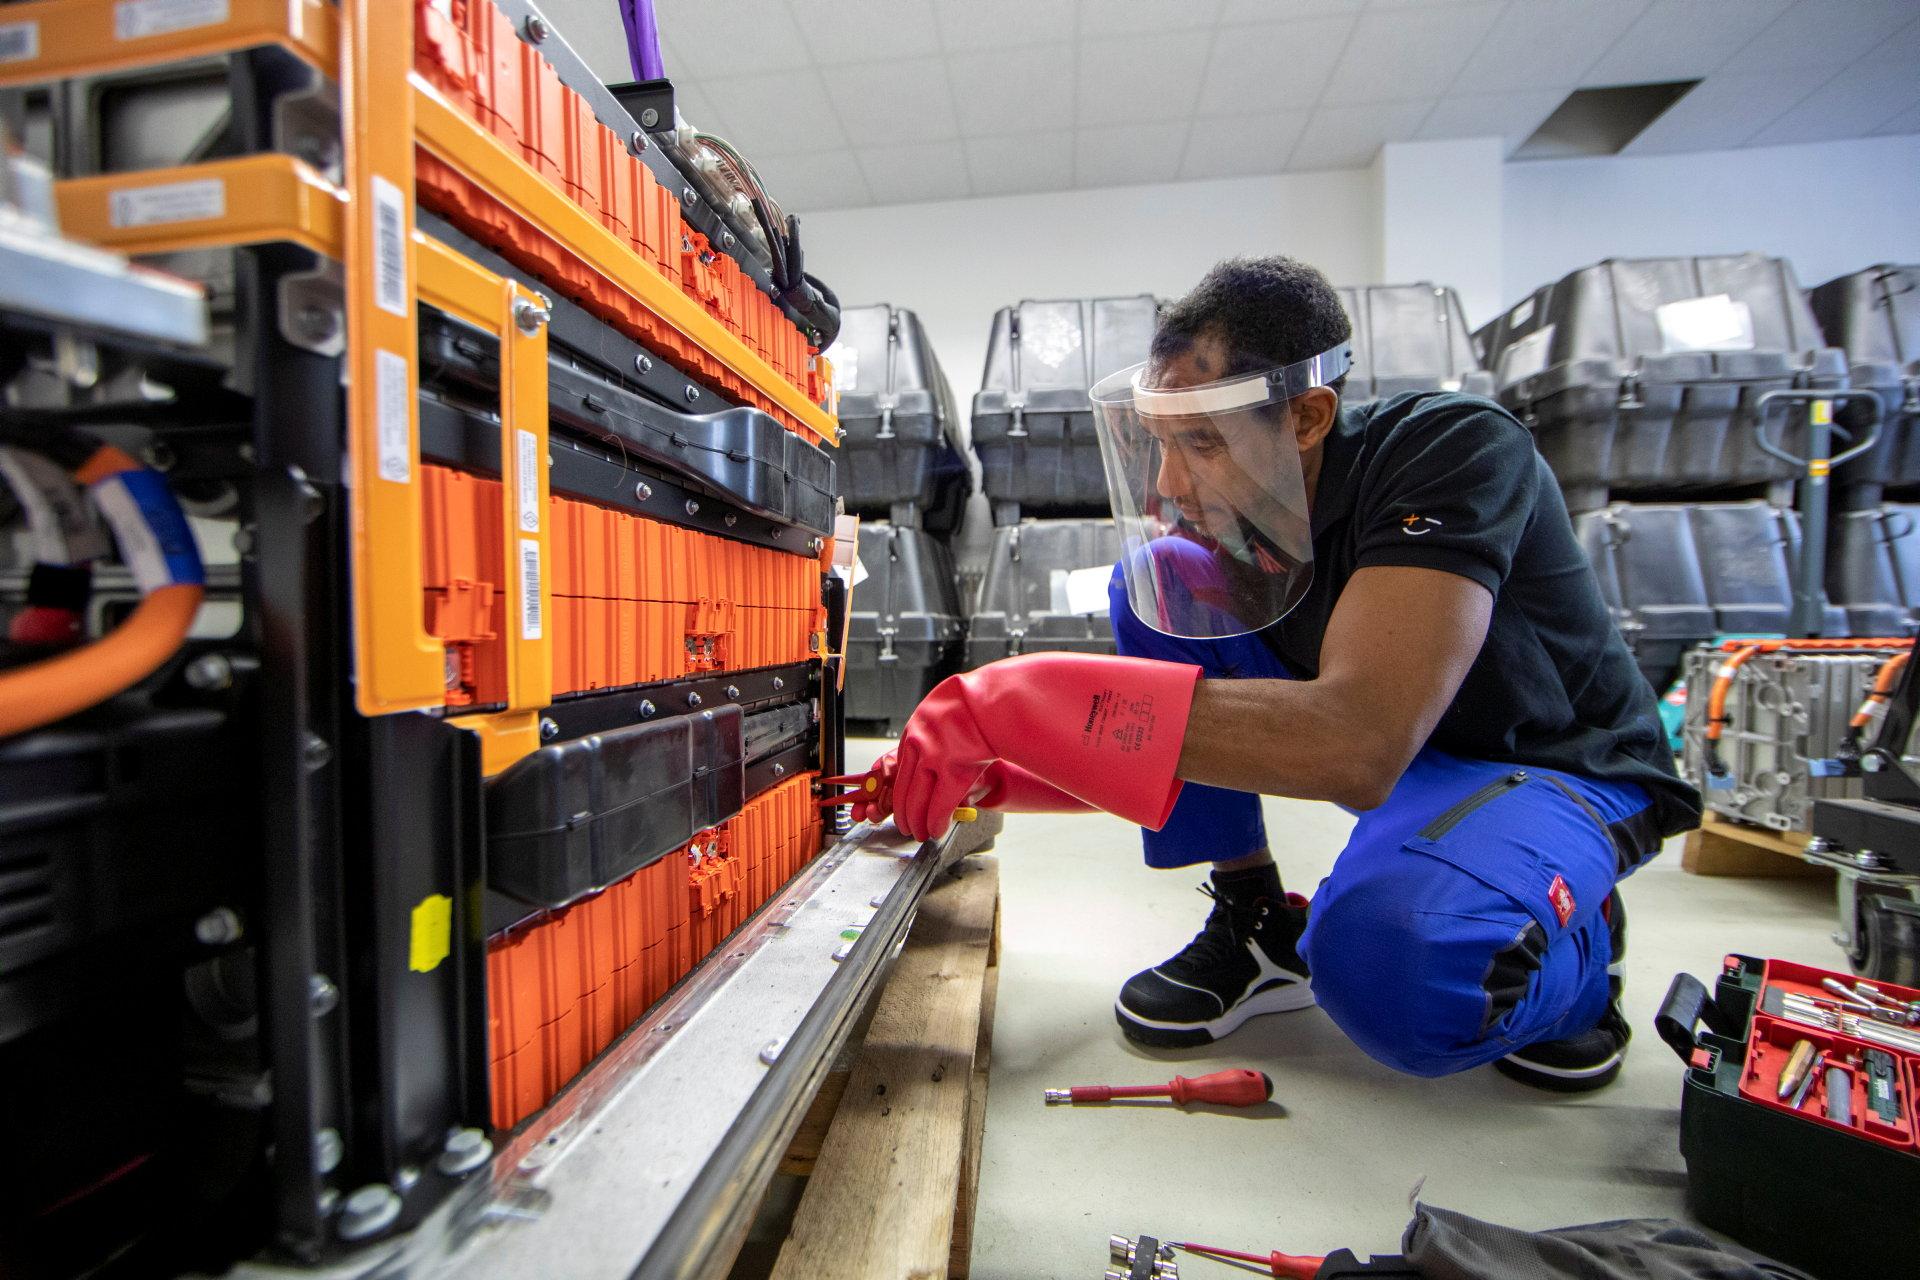 Mann mit roten Handschuhen schraubt an Batterie